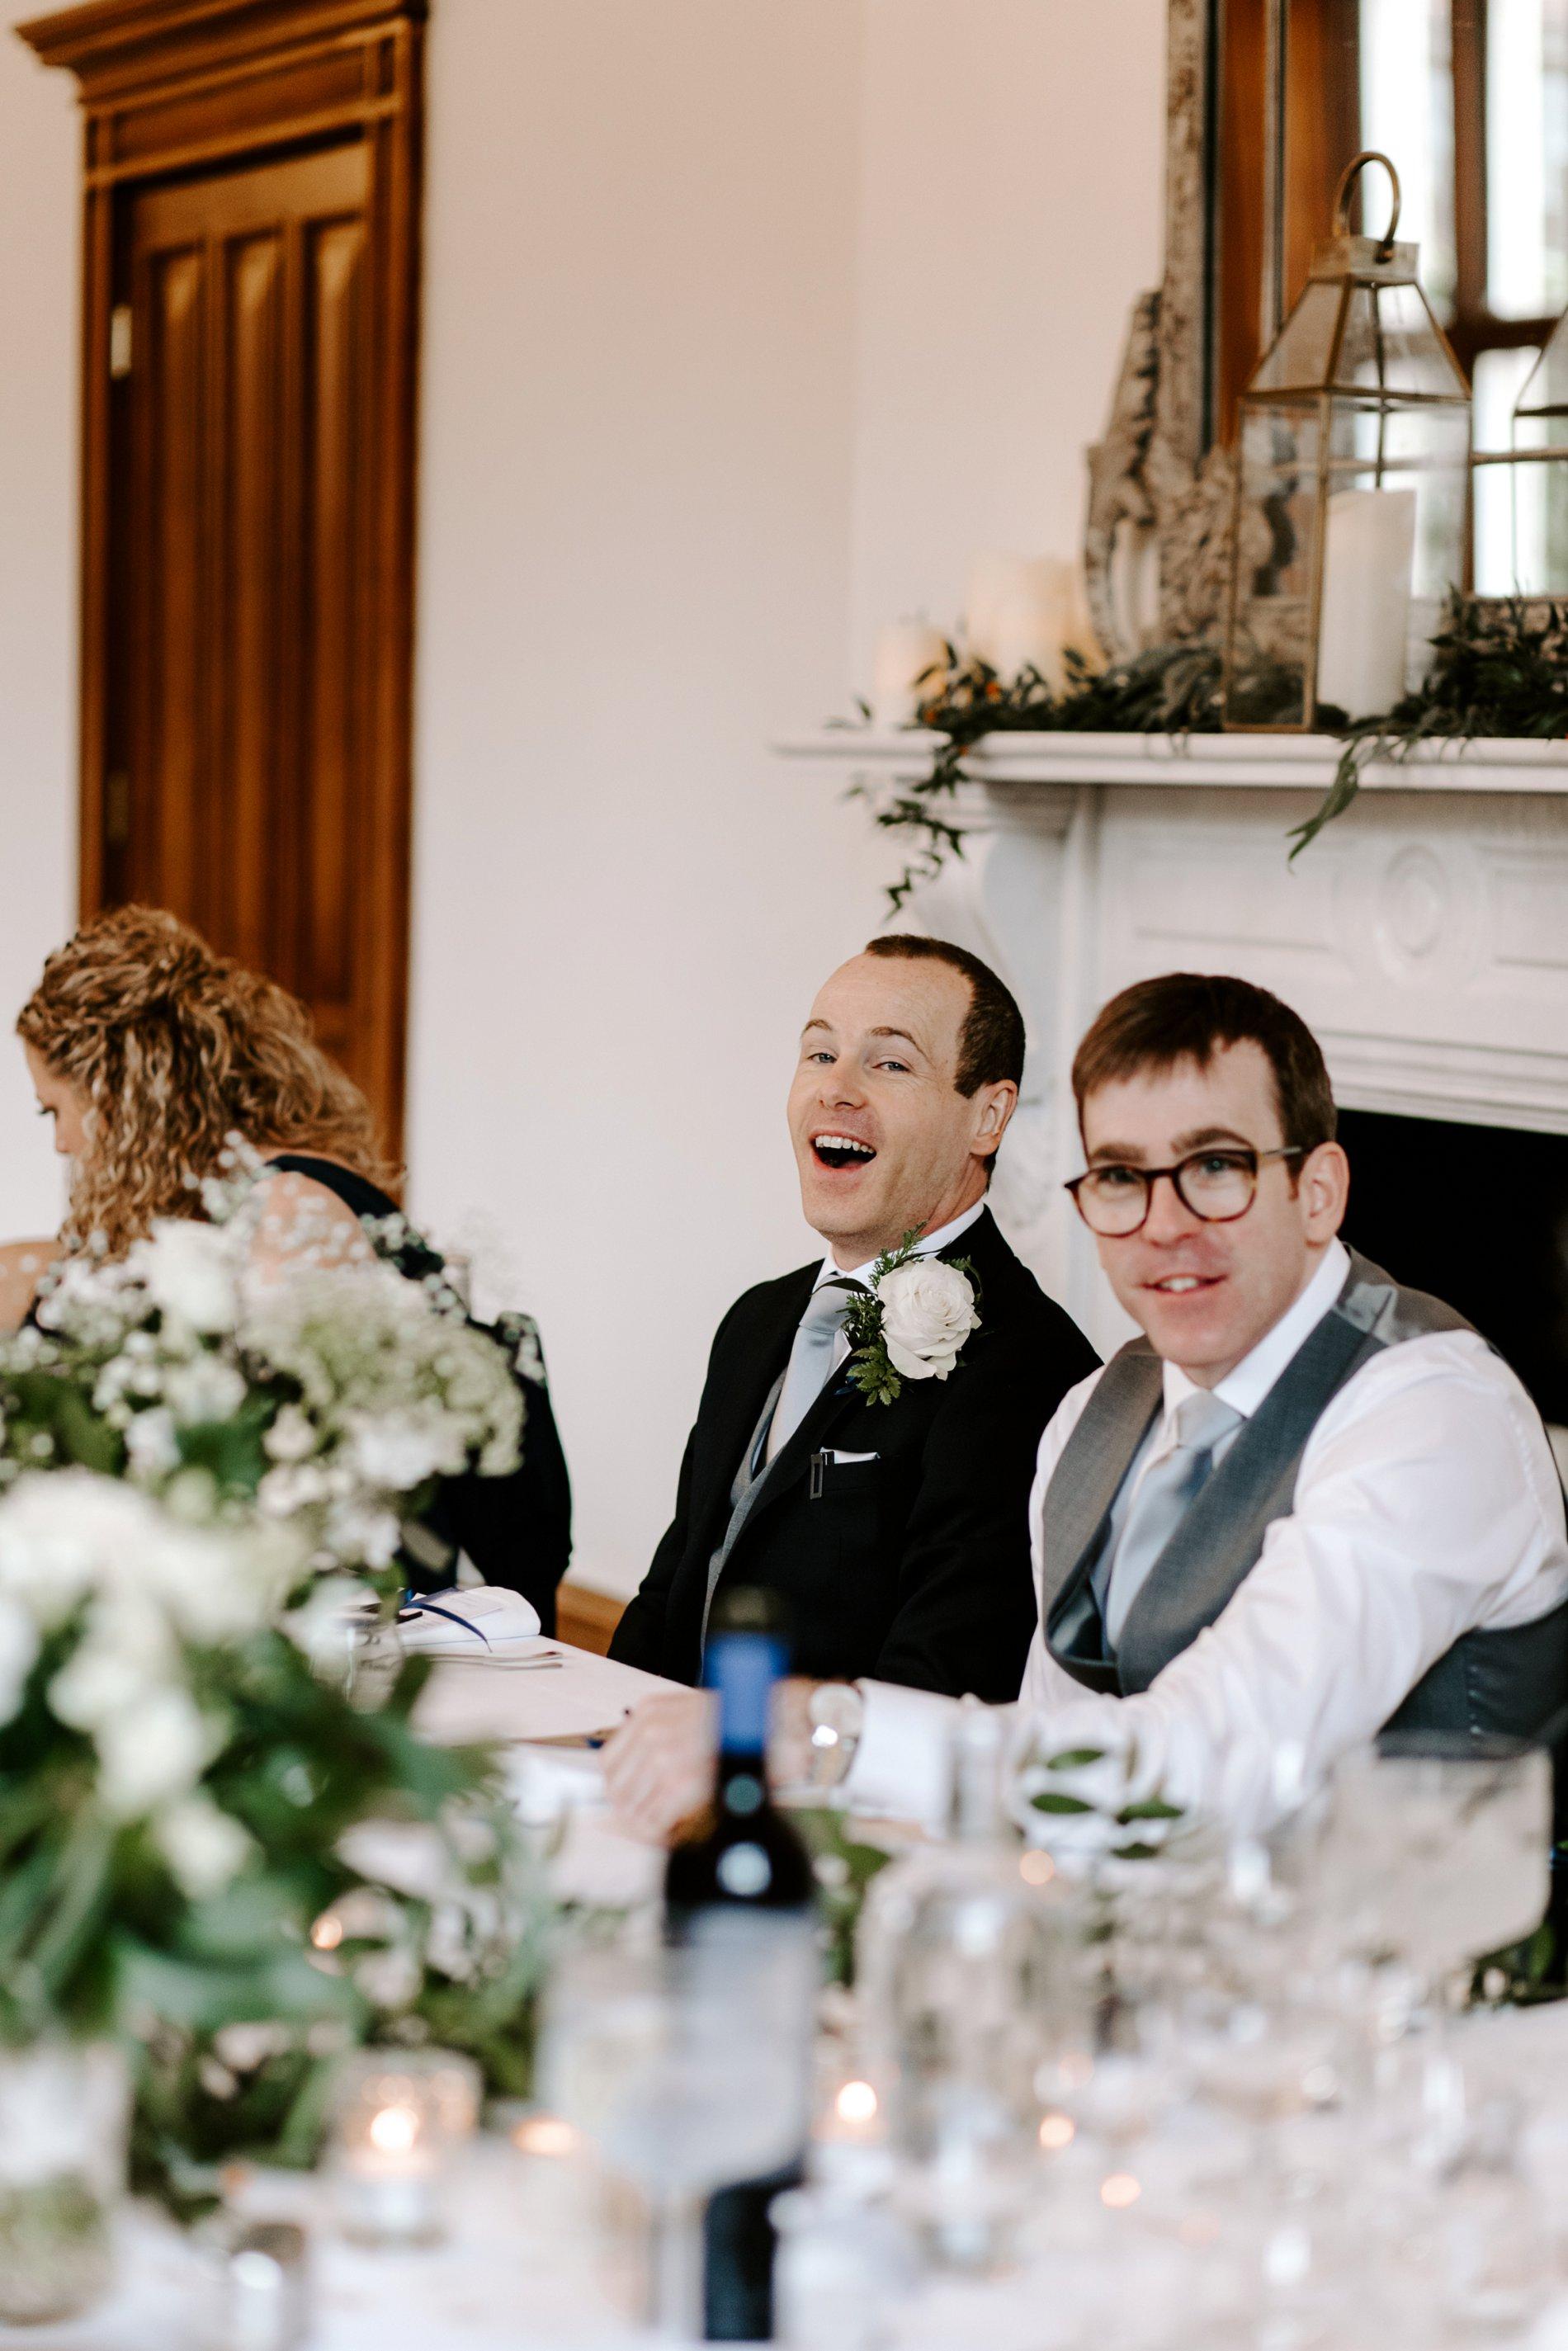 An Elegant White Wedding at Thicket Priory (c) Carla Whittingham Photography (67)